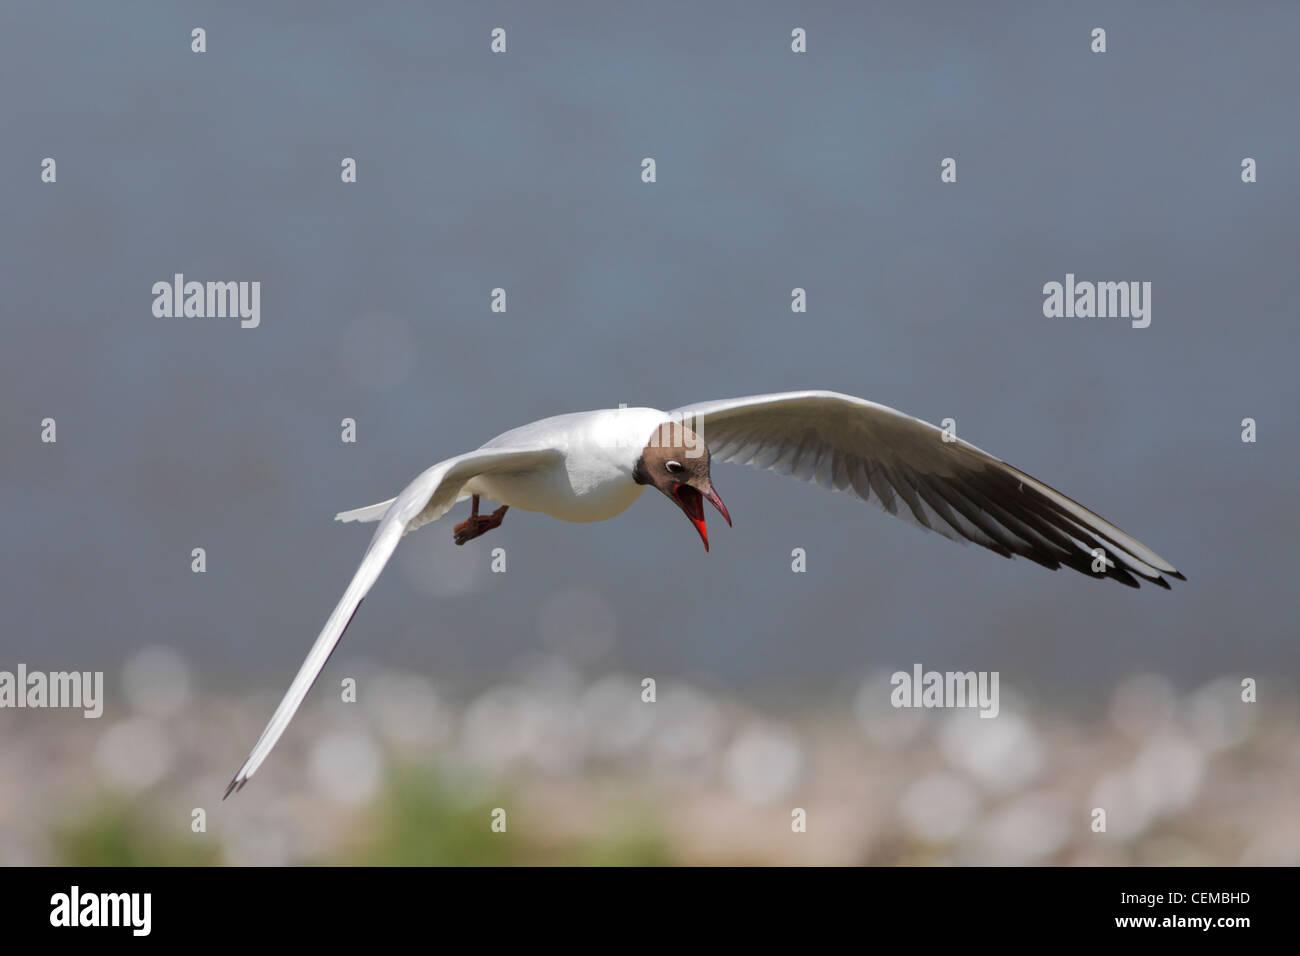 black headed gull (Lat.: Larus ridibundus) - Stock Image